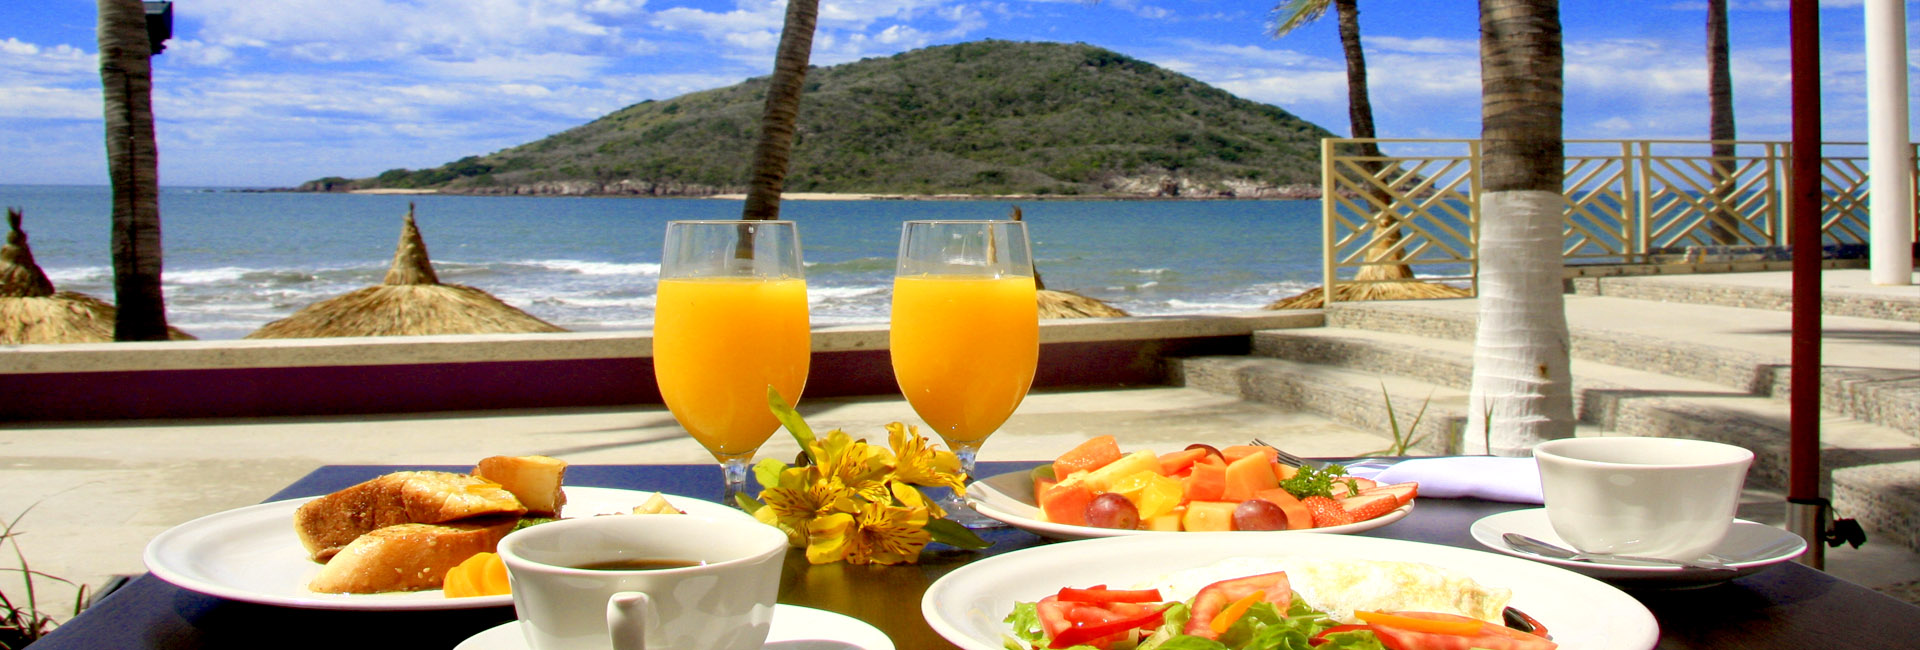 restaurantes en la playa mazatlan